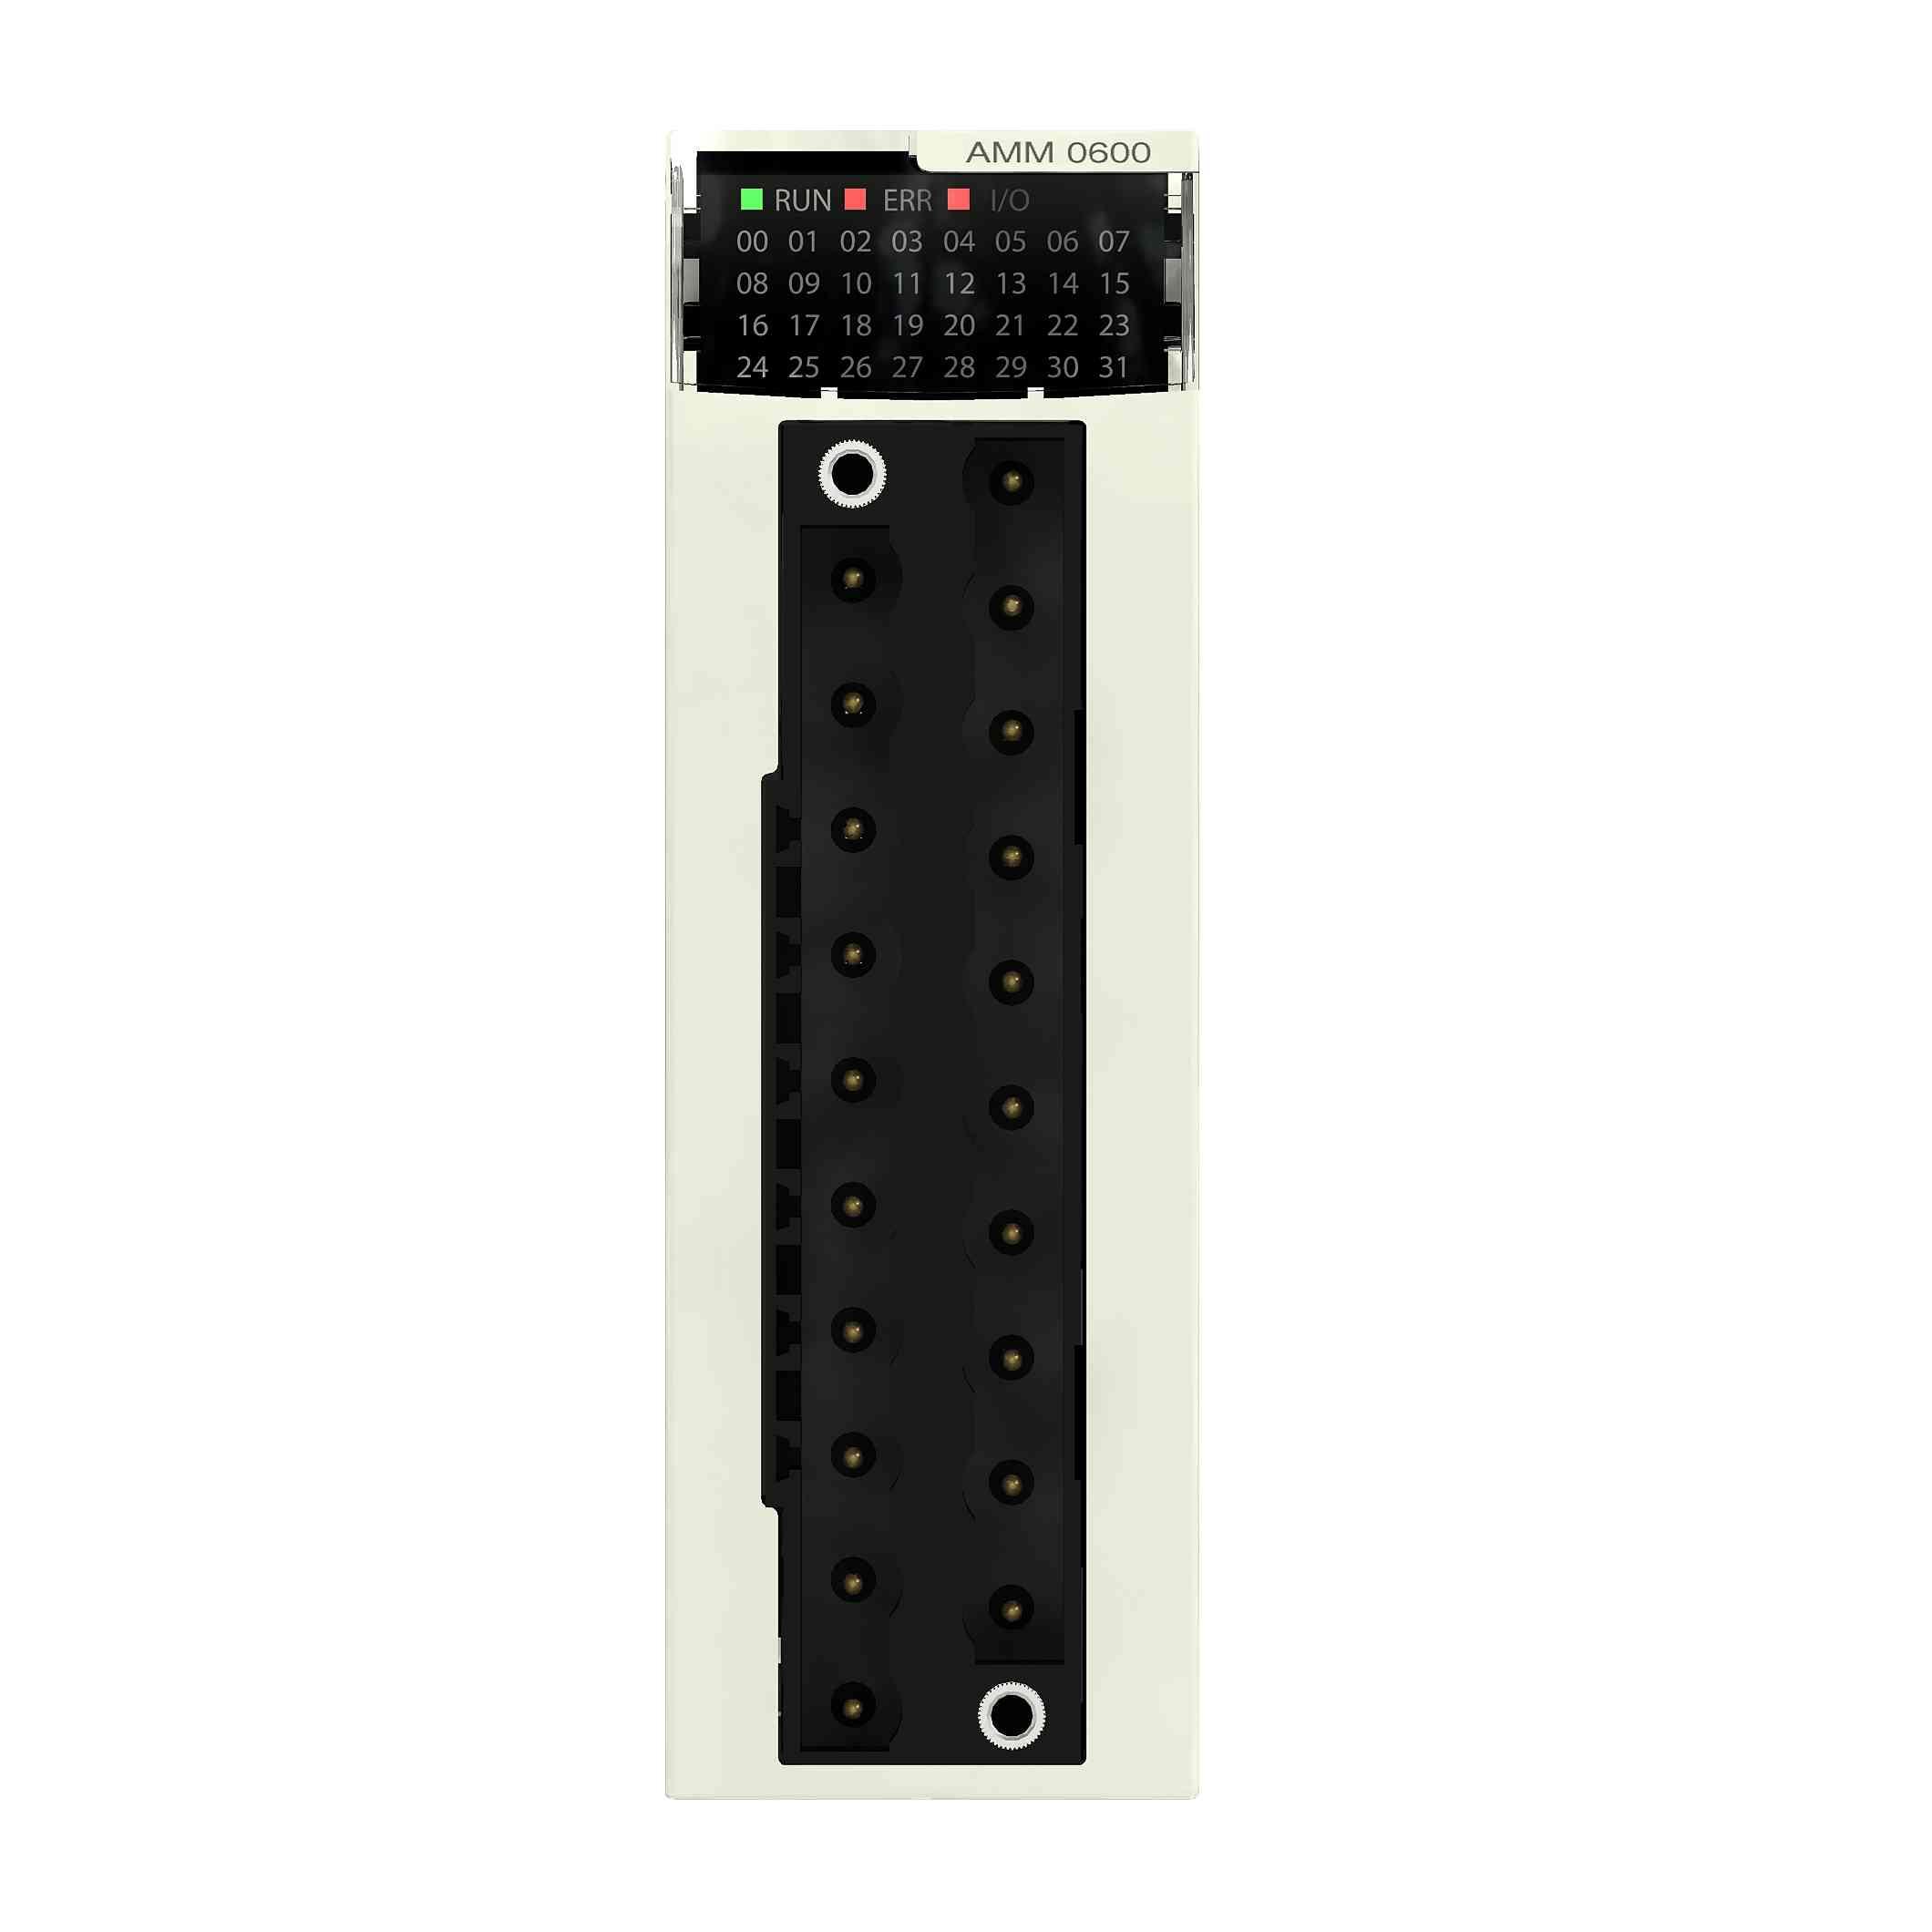 Mešani modul M340 analogni I/O - 4 vhodi 0 do 20 ma - 2 izhoda 0 do 20 ma